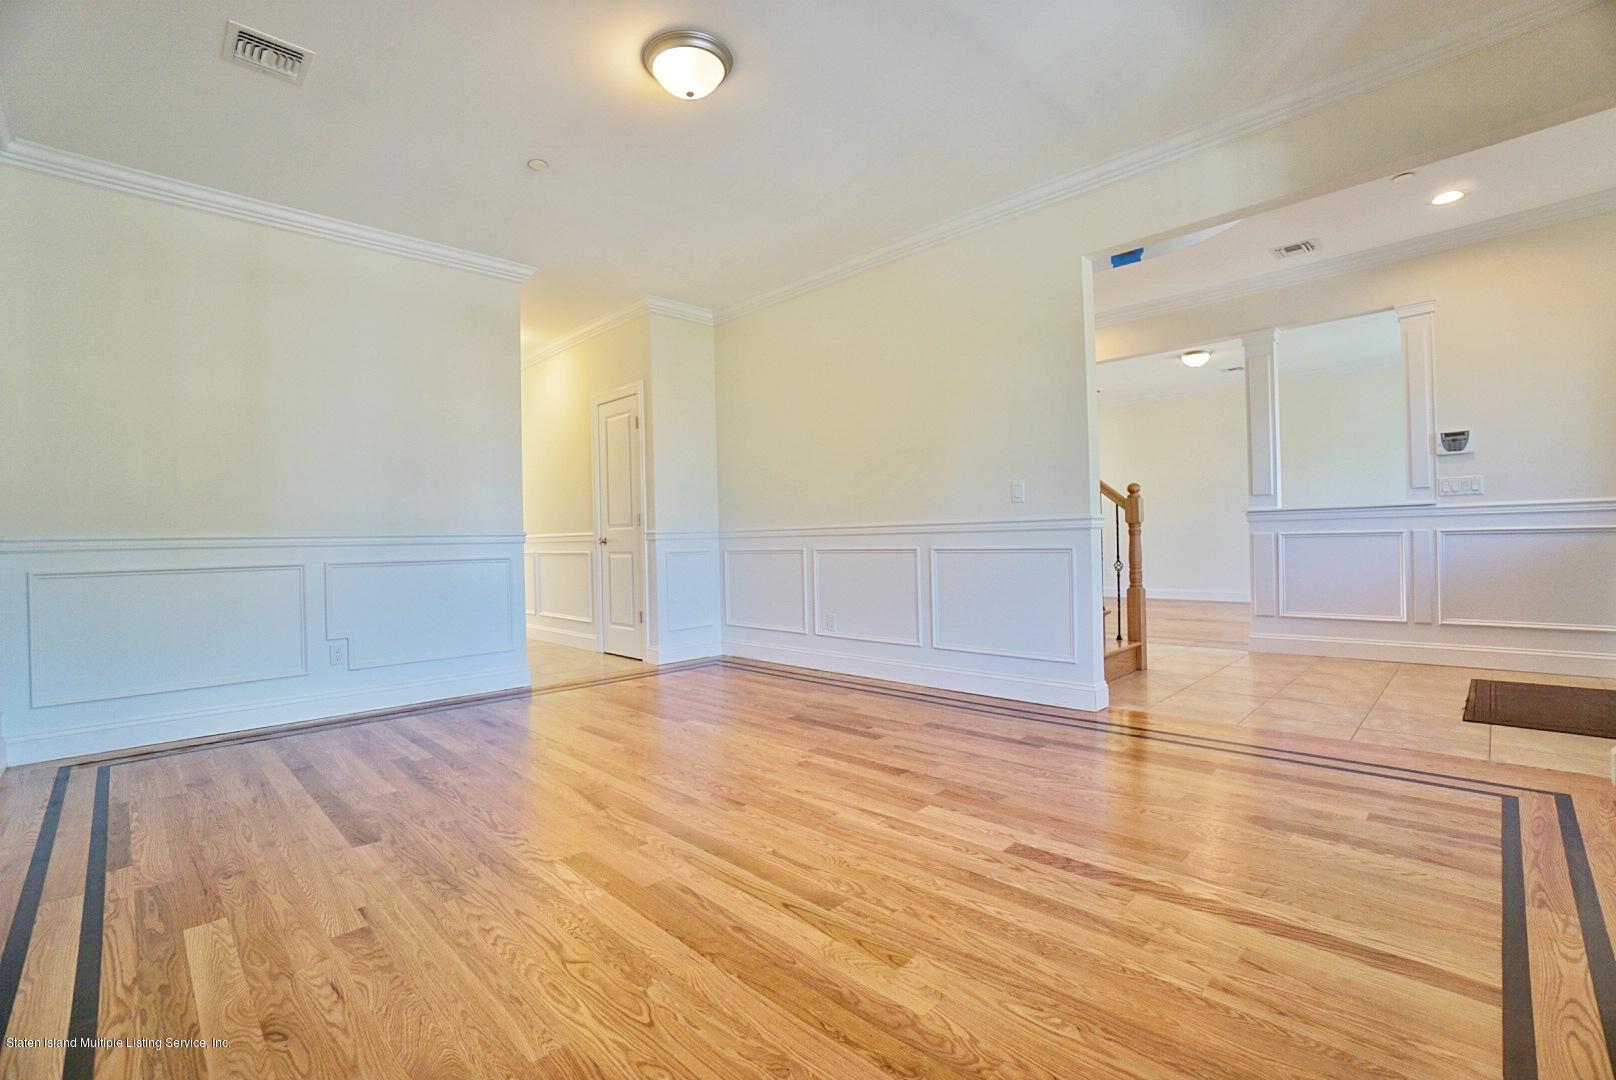 Single Family - Detached 678 Yetman Avenue  Staten Island, NY 10307, MLS-1132766-13